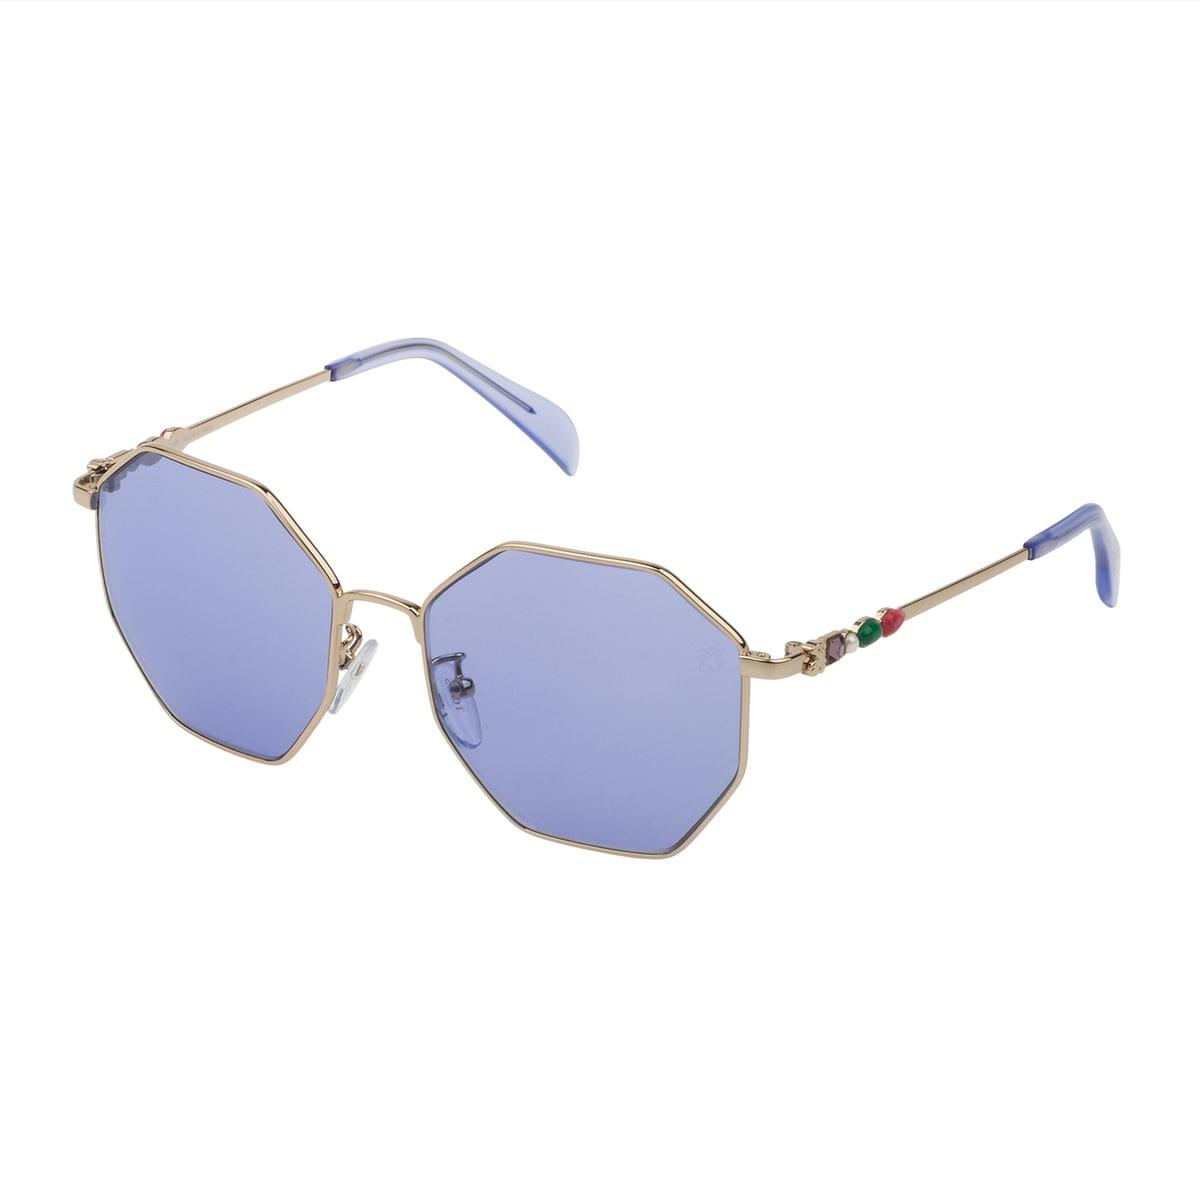 Óculos de sol Jolie Seventies em Metal na cor azul